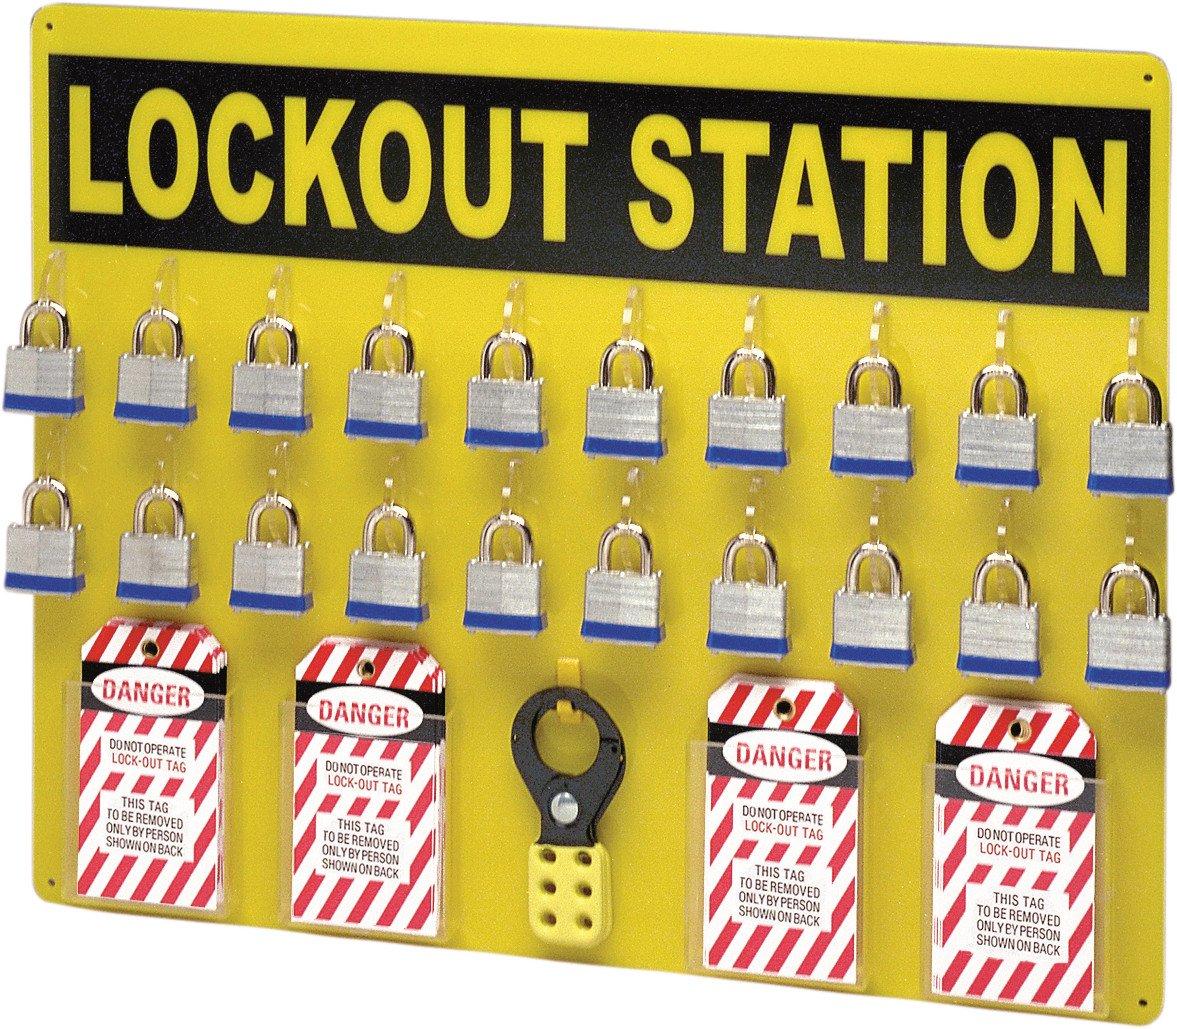 Brady LC209G Prinzing Lockout Station eqpd 19x24 (1 Station)